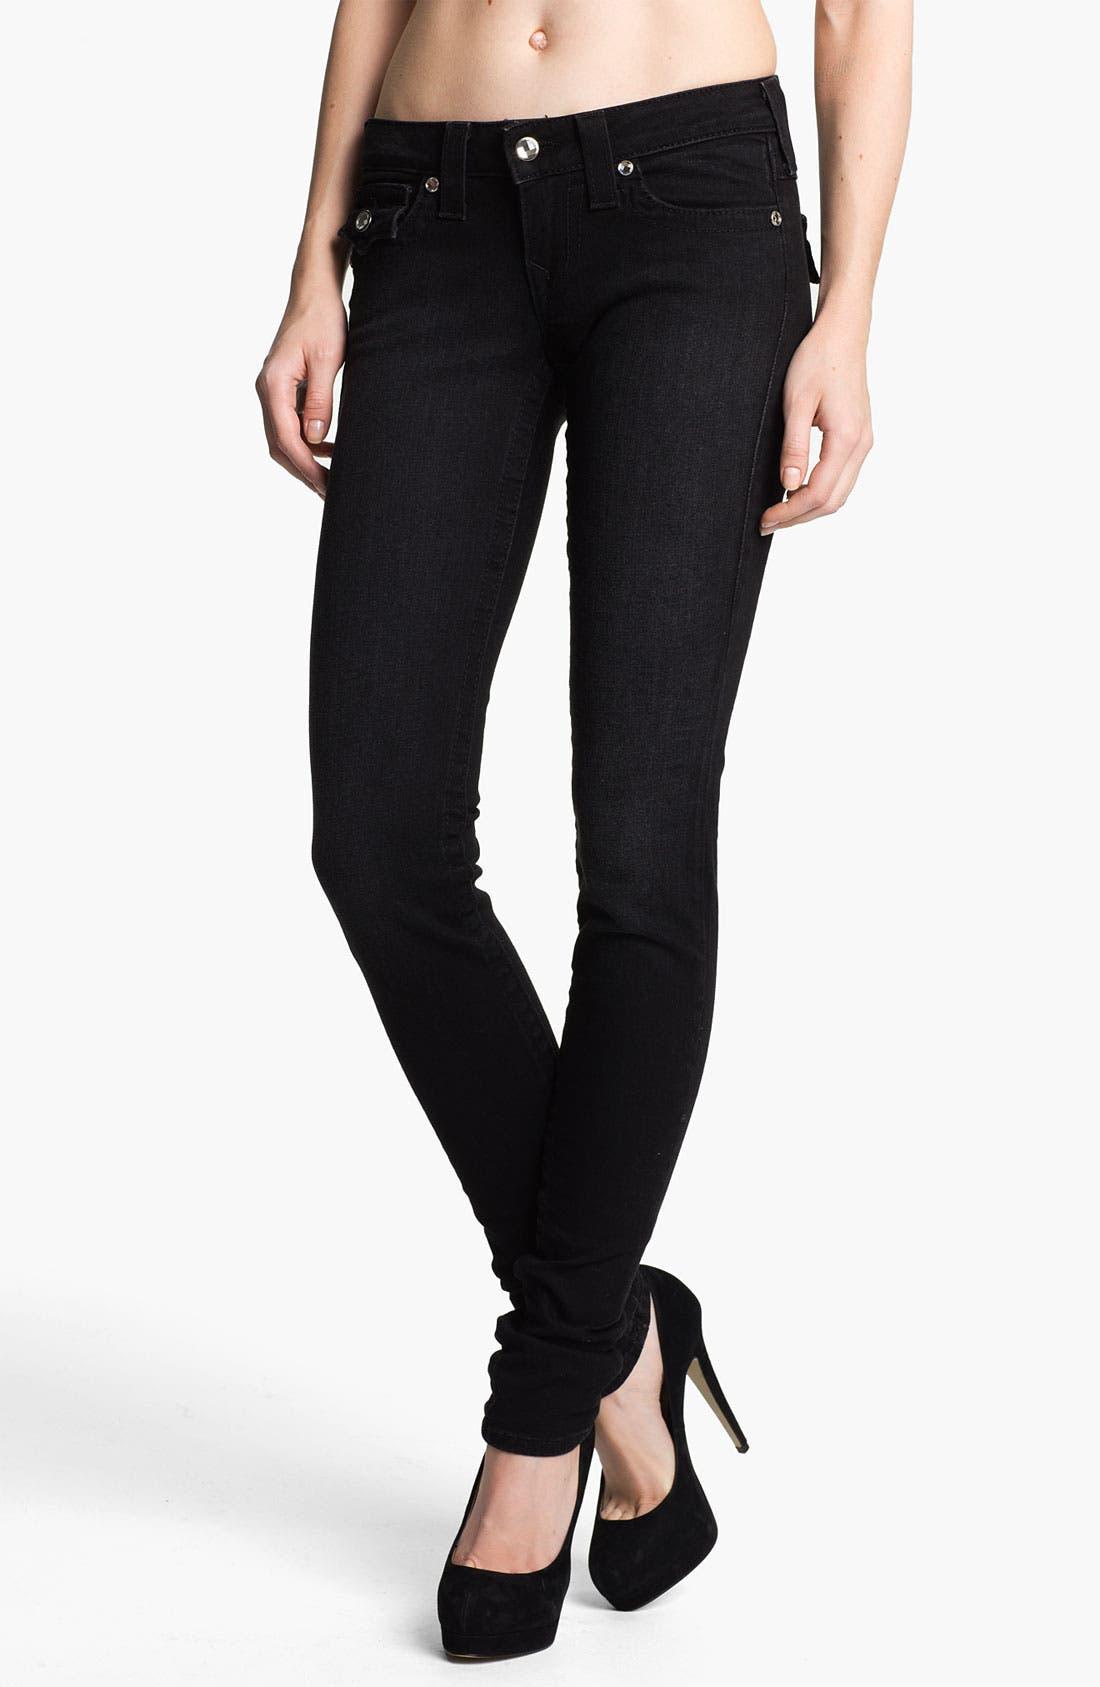 Main Image - True Religion Brand Jeans 'Julie' Crystal Button Skinny Jeans (Lonestar)